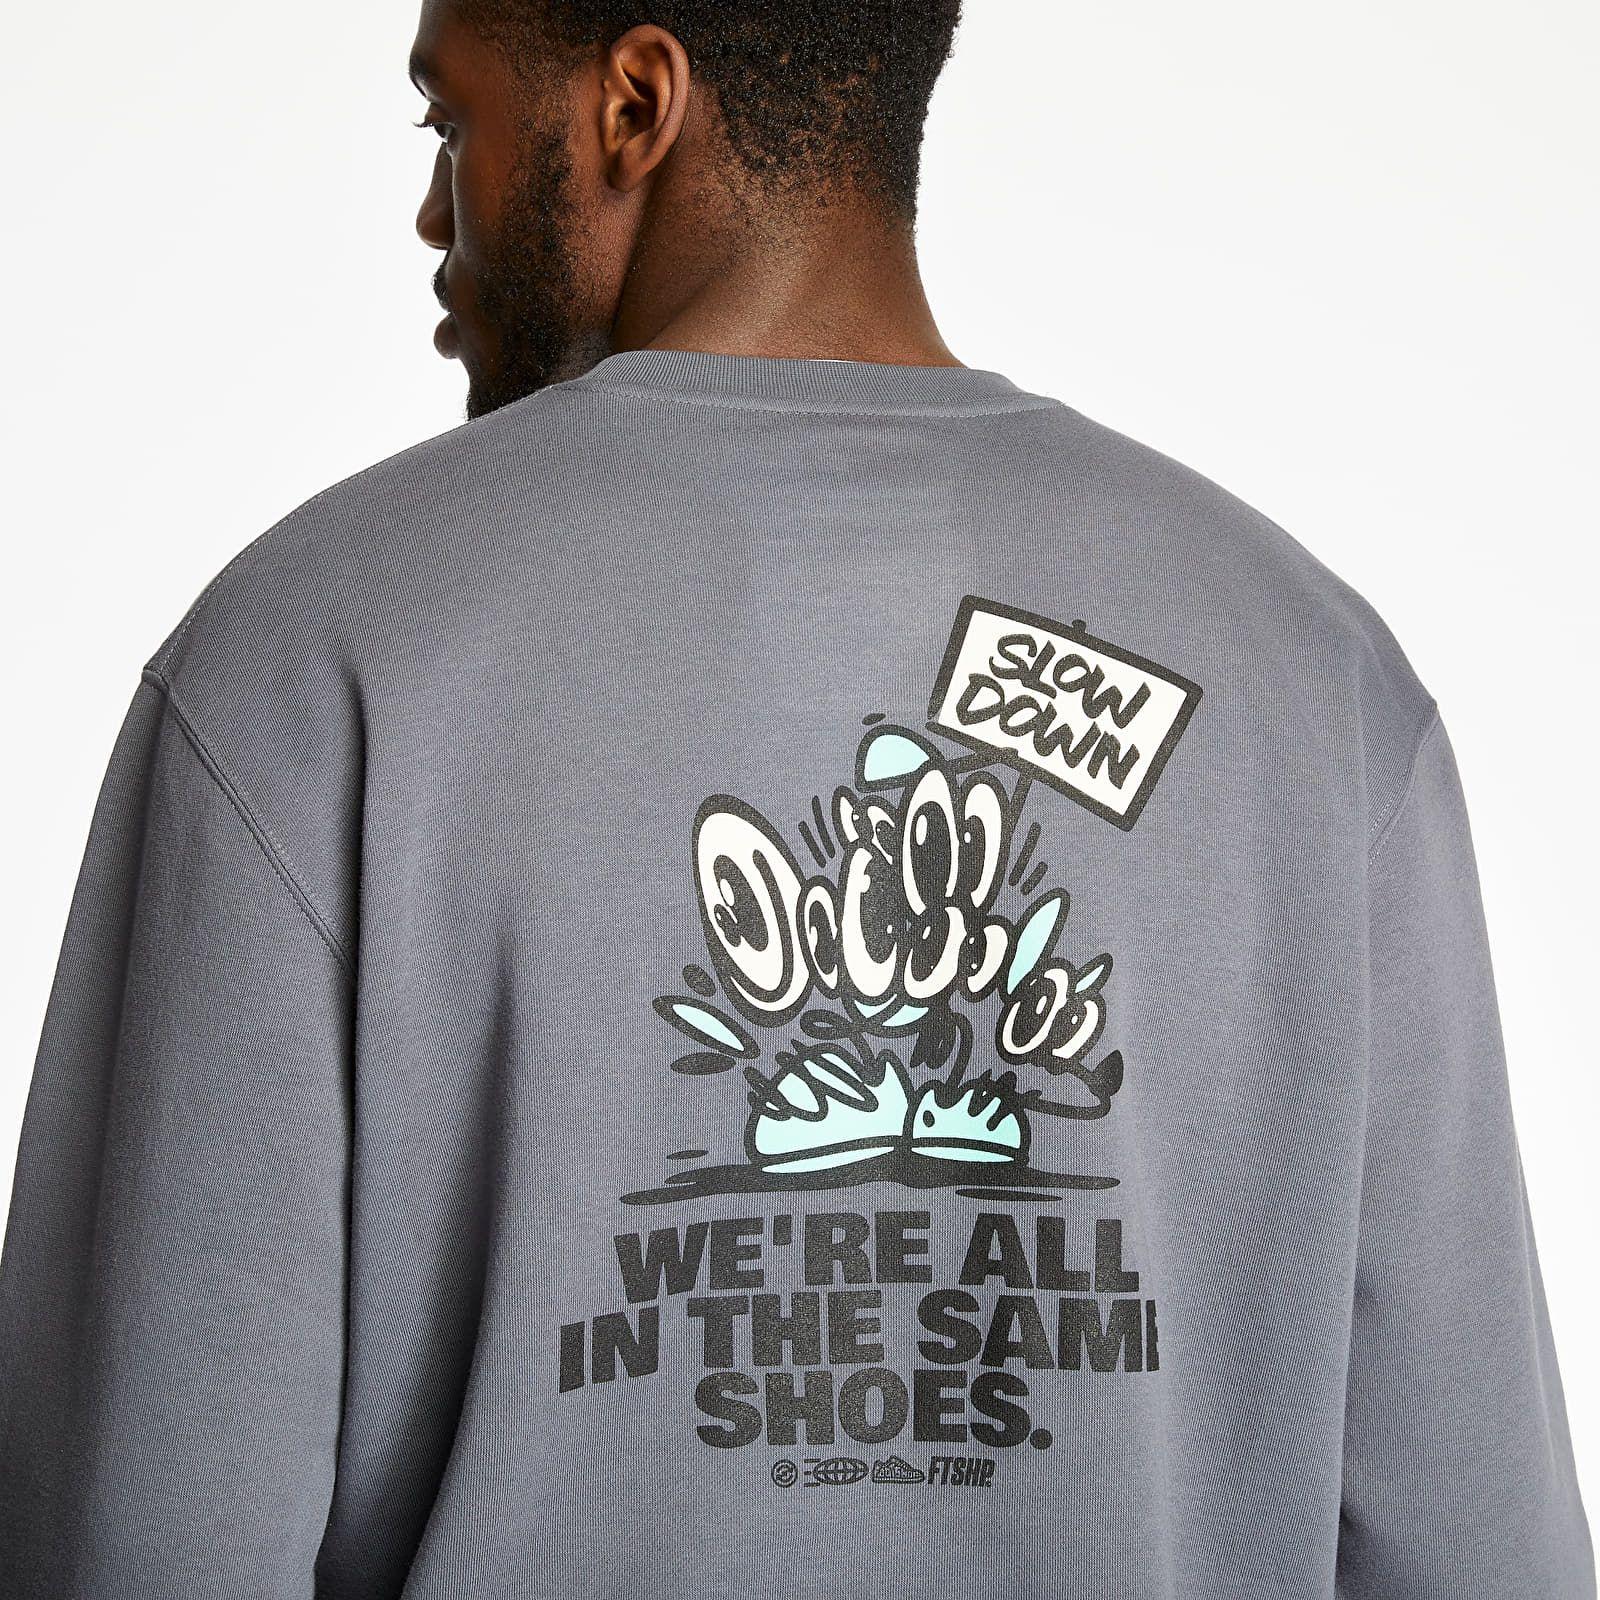 Footshop University: Spríjemní si nástup do školy štýlovými kúskami od Nike, Pleasures či Vans